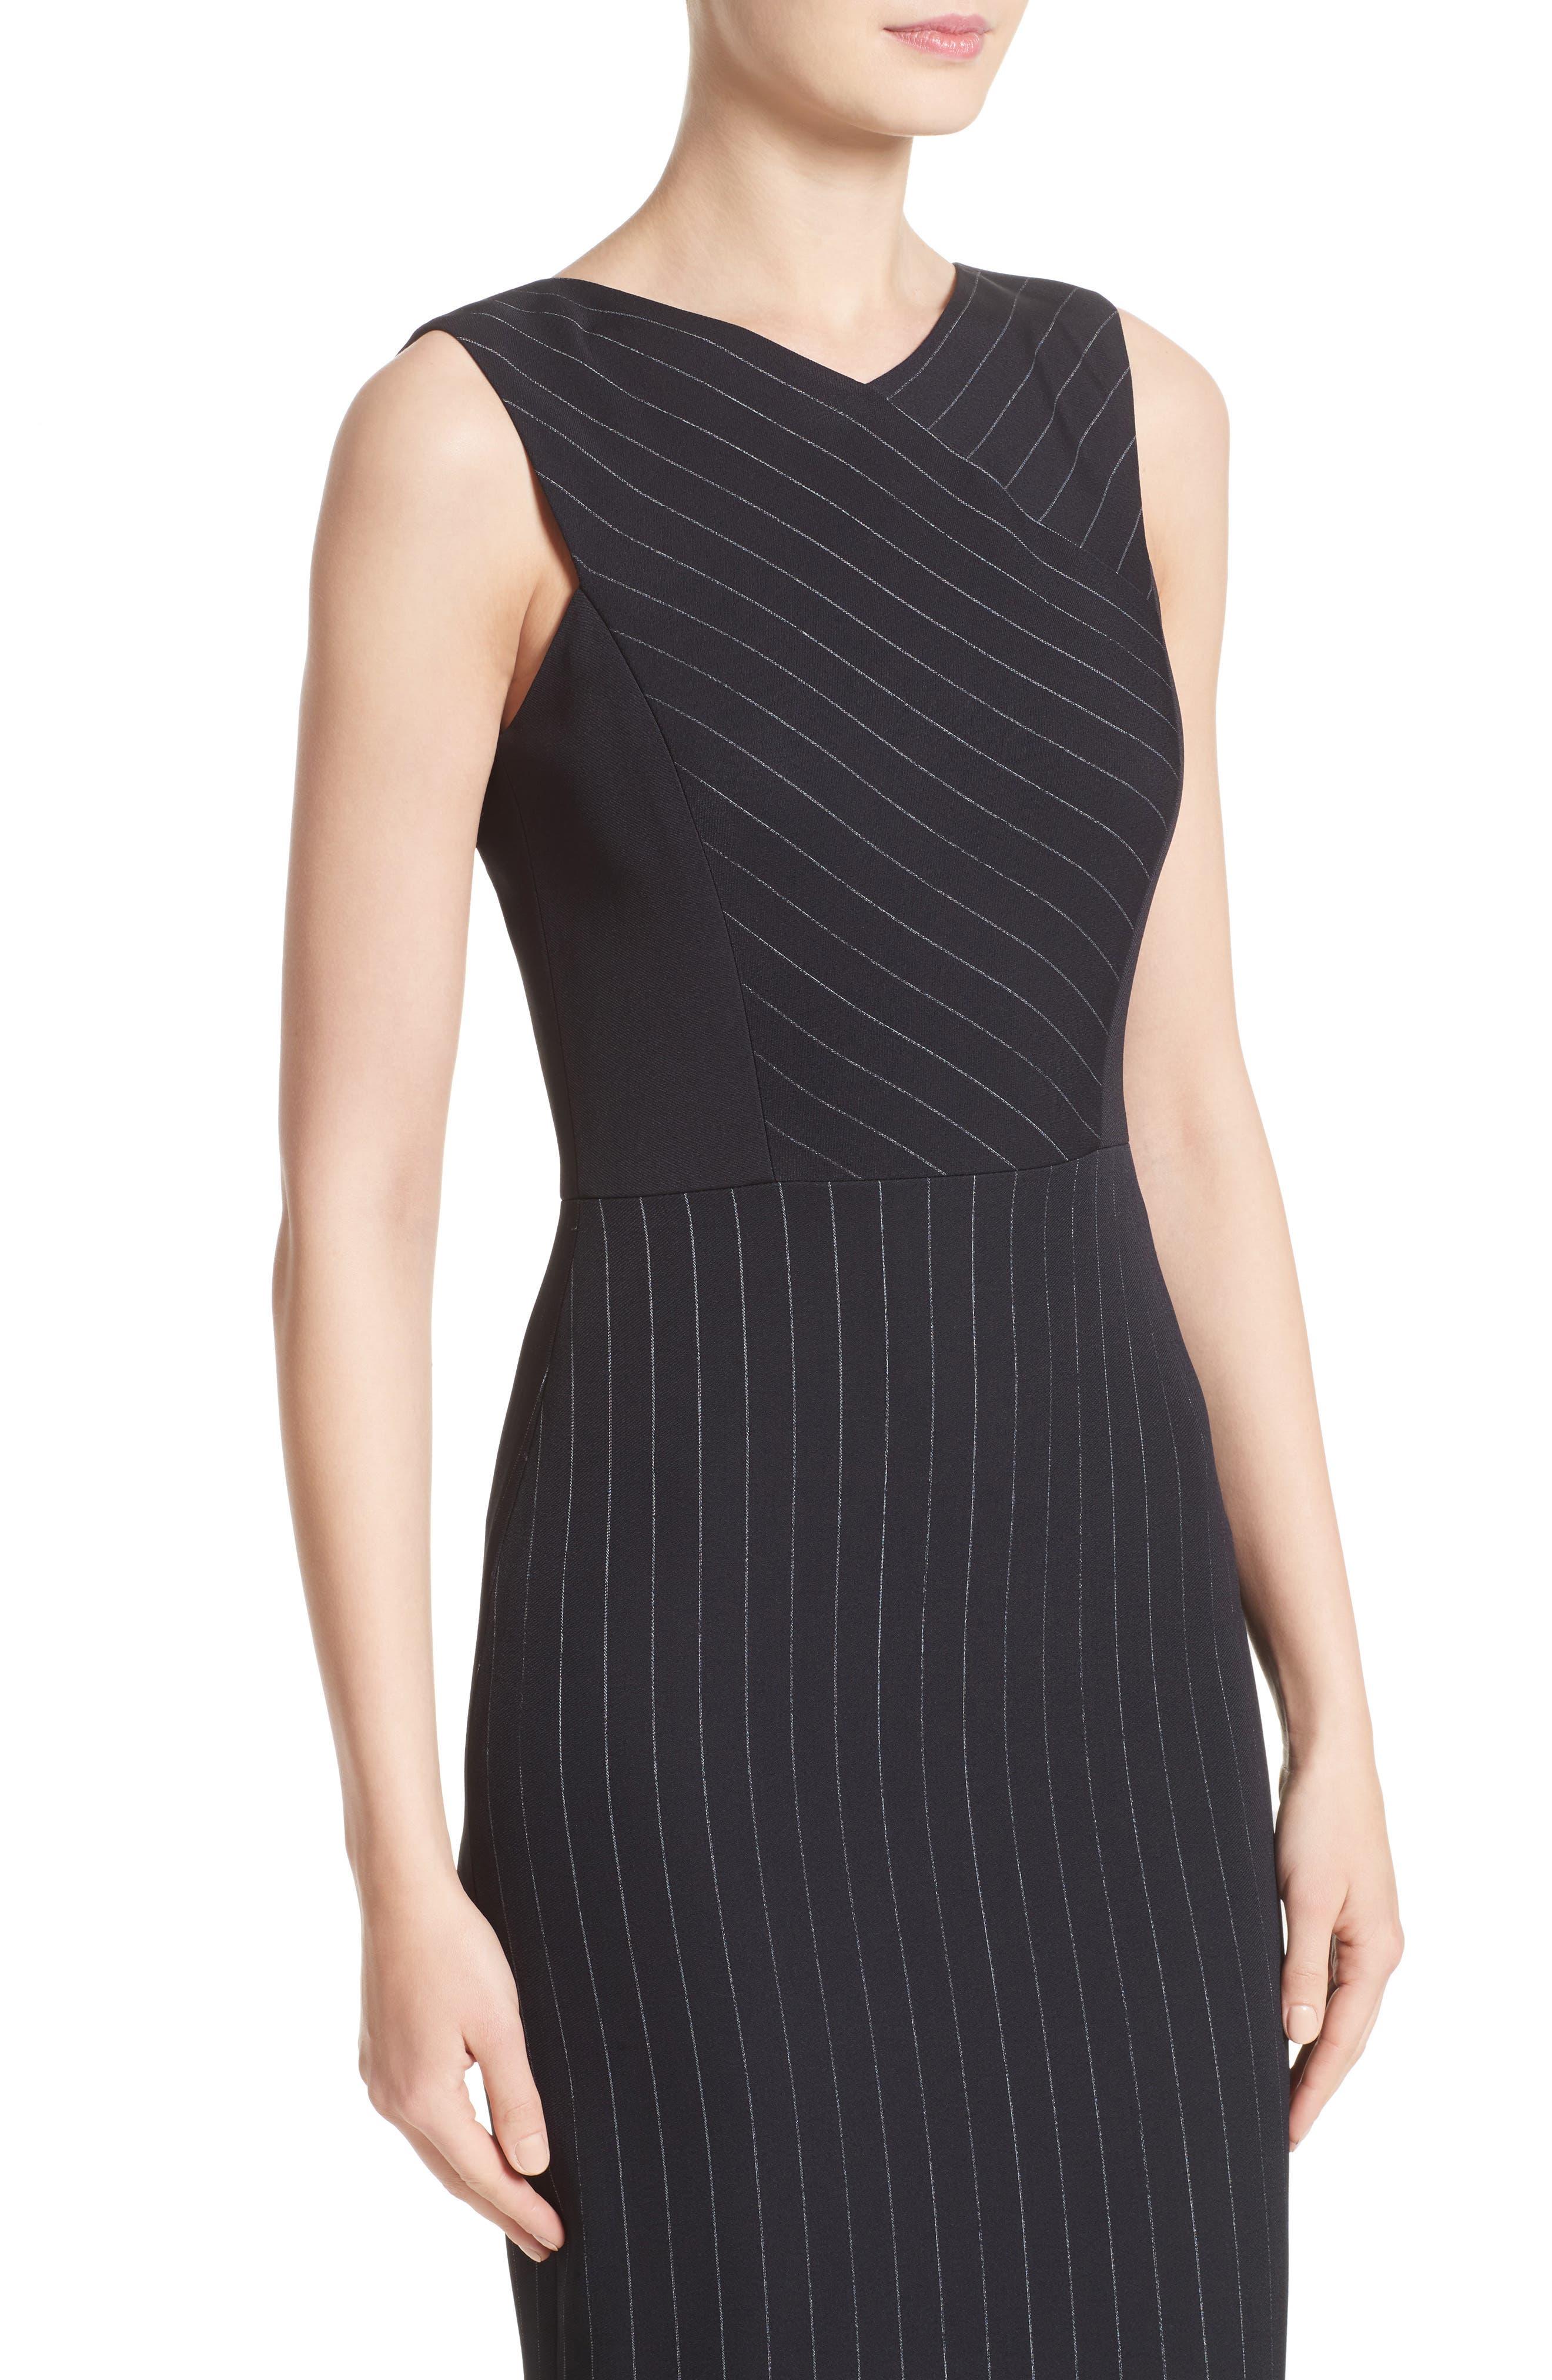 Pinstripe Stretch Dress,                             Alternate thumbnail 4, color,                             001